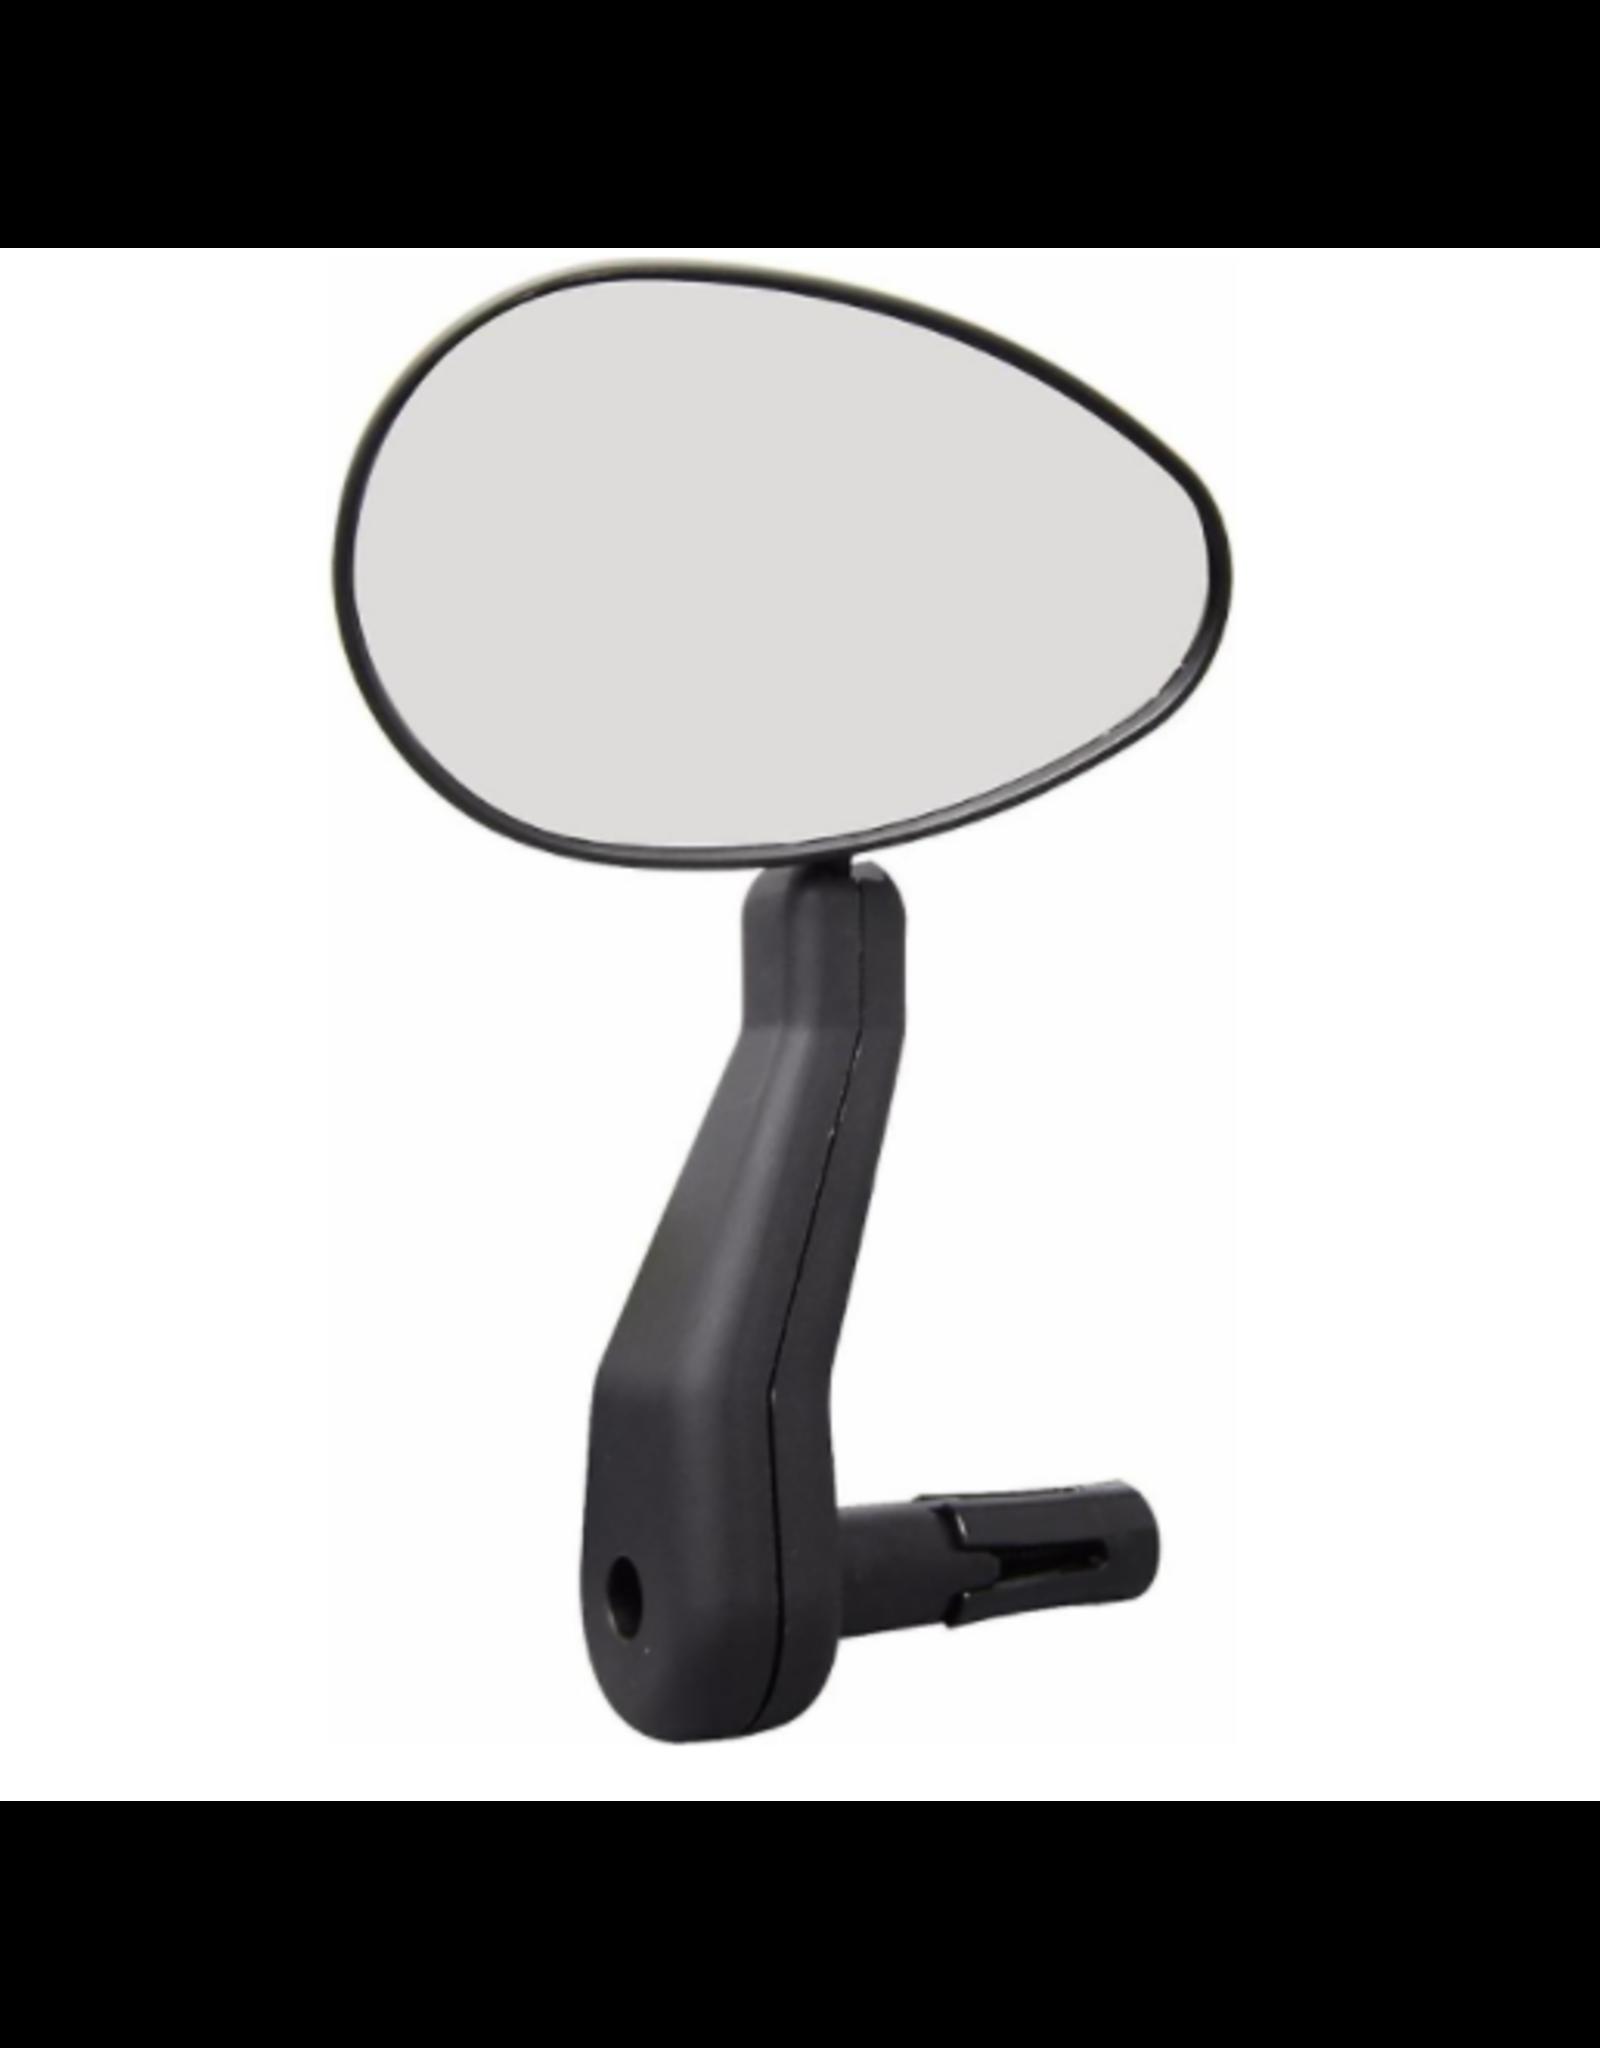 Cateye CatEye, BM-500G-L, Mirror, Left